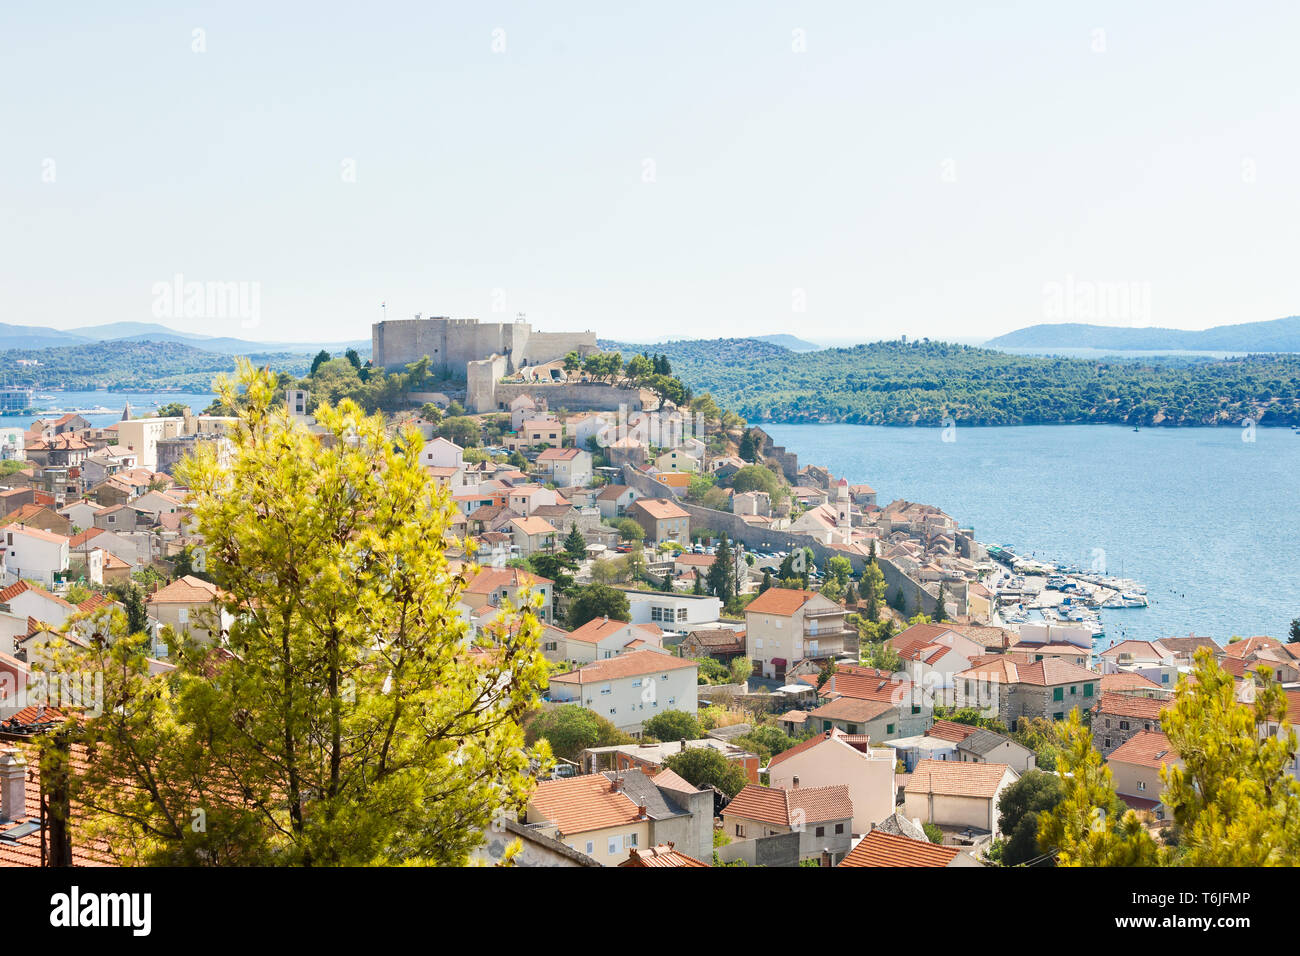 Sibenik, Kroatien, Europa - Blick auf die Altstadt von Sibenik Stockfoto